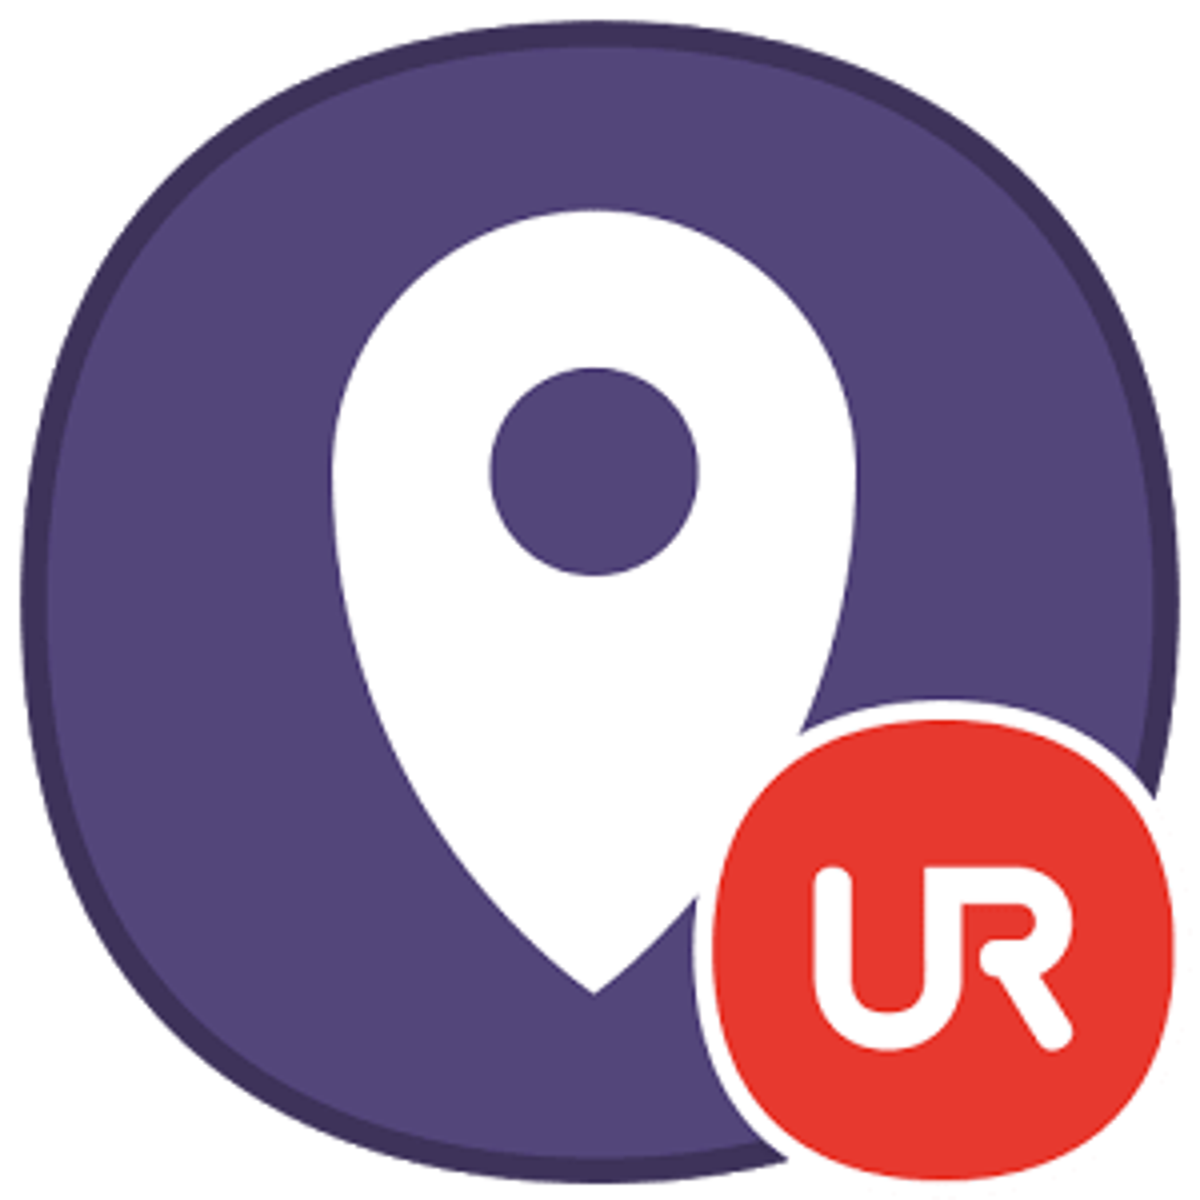 UR explorer 4.1 y versiones superiores